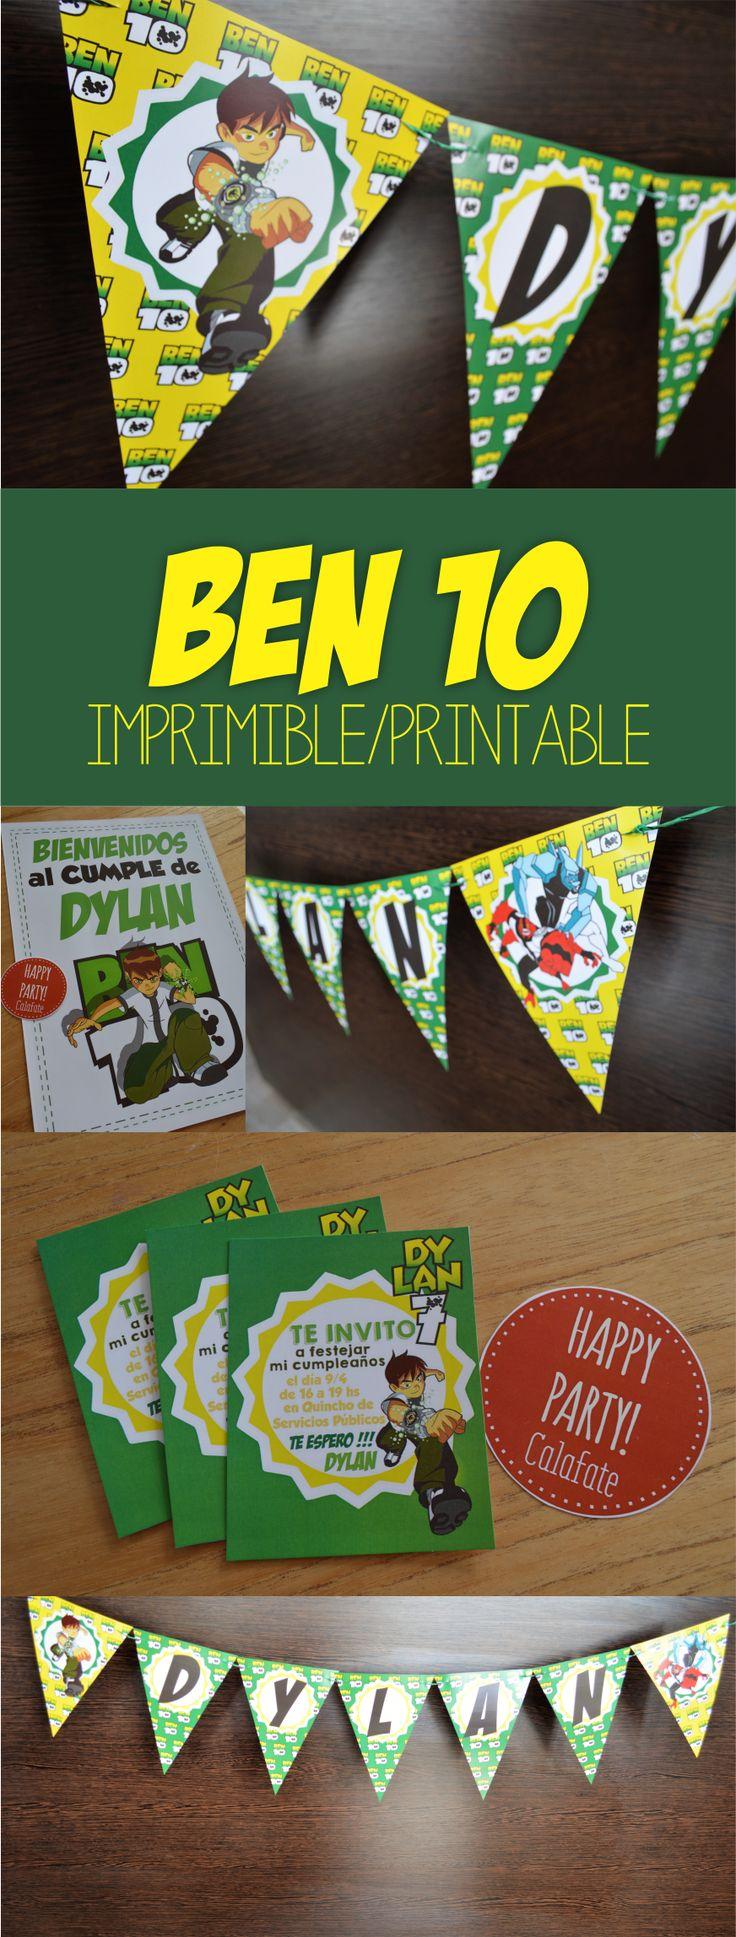 Ben 10 imprimible. Printable Ben 10. Fiesta. Party.